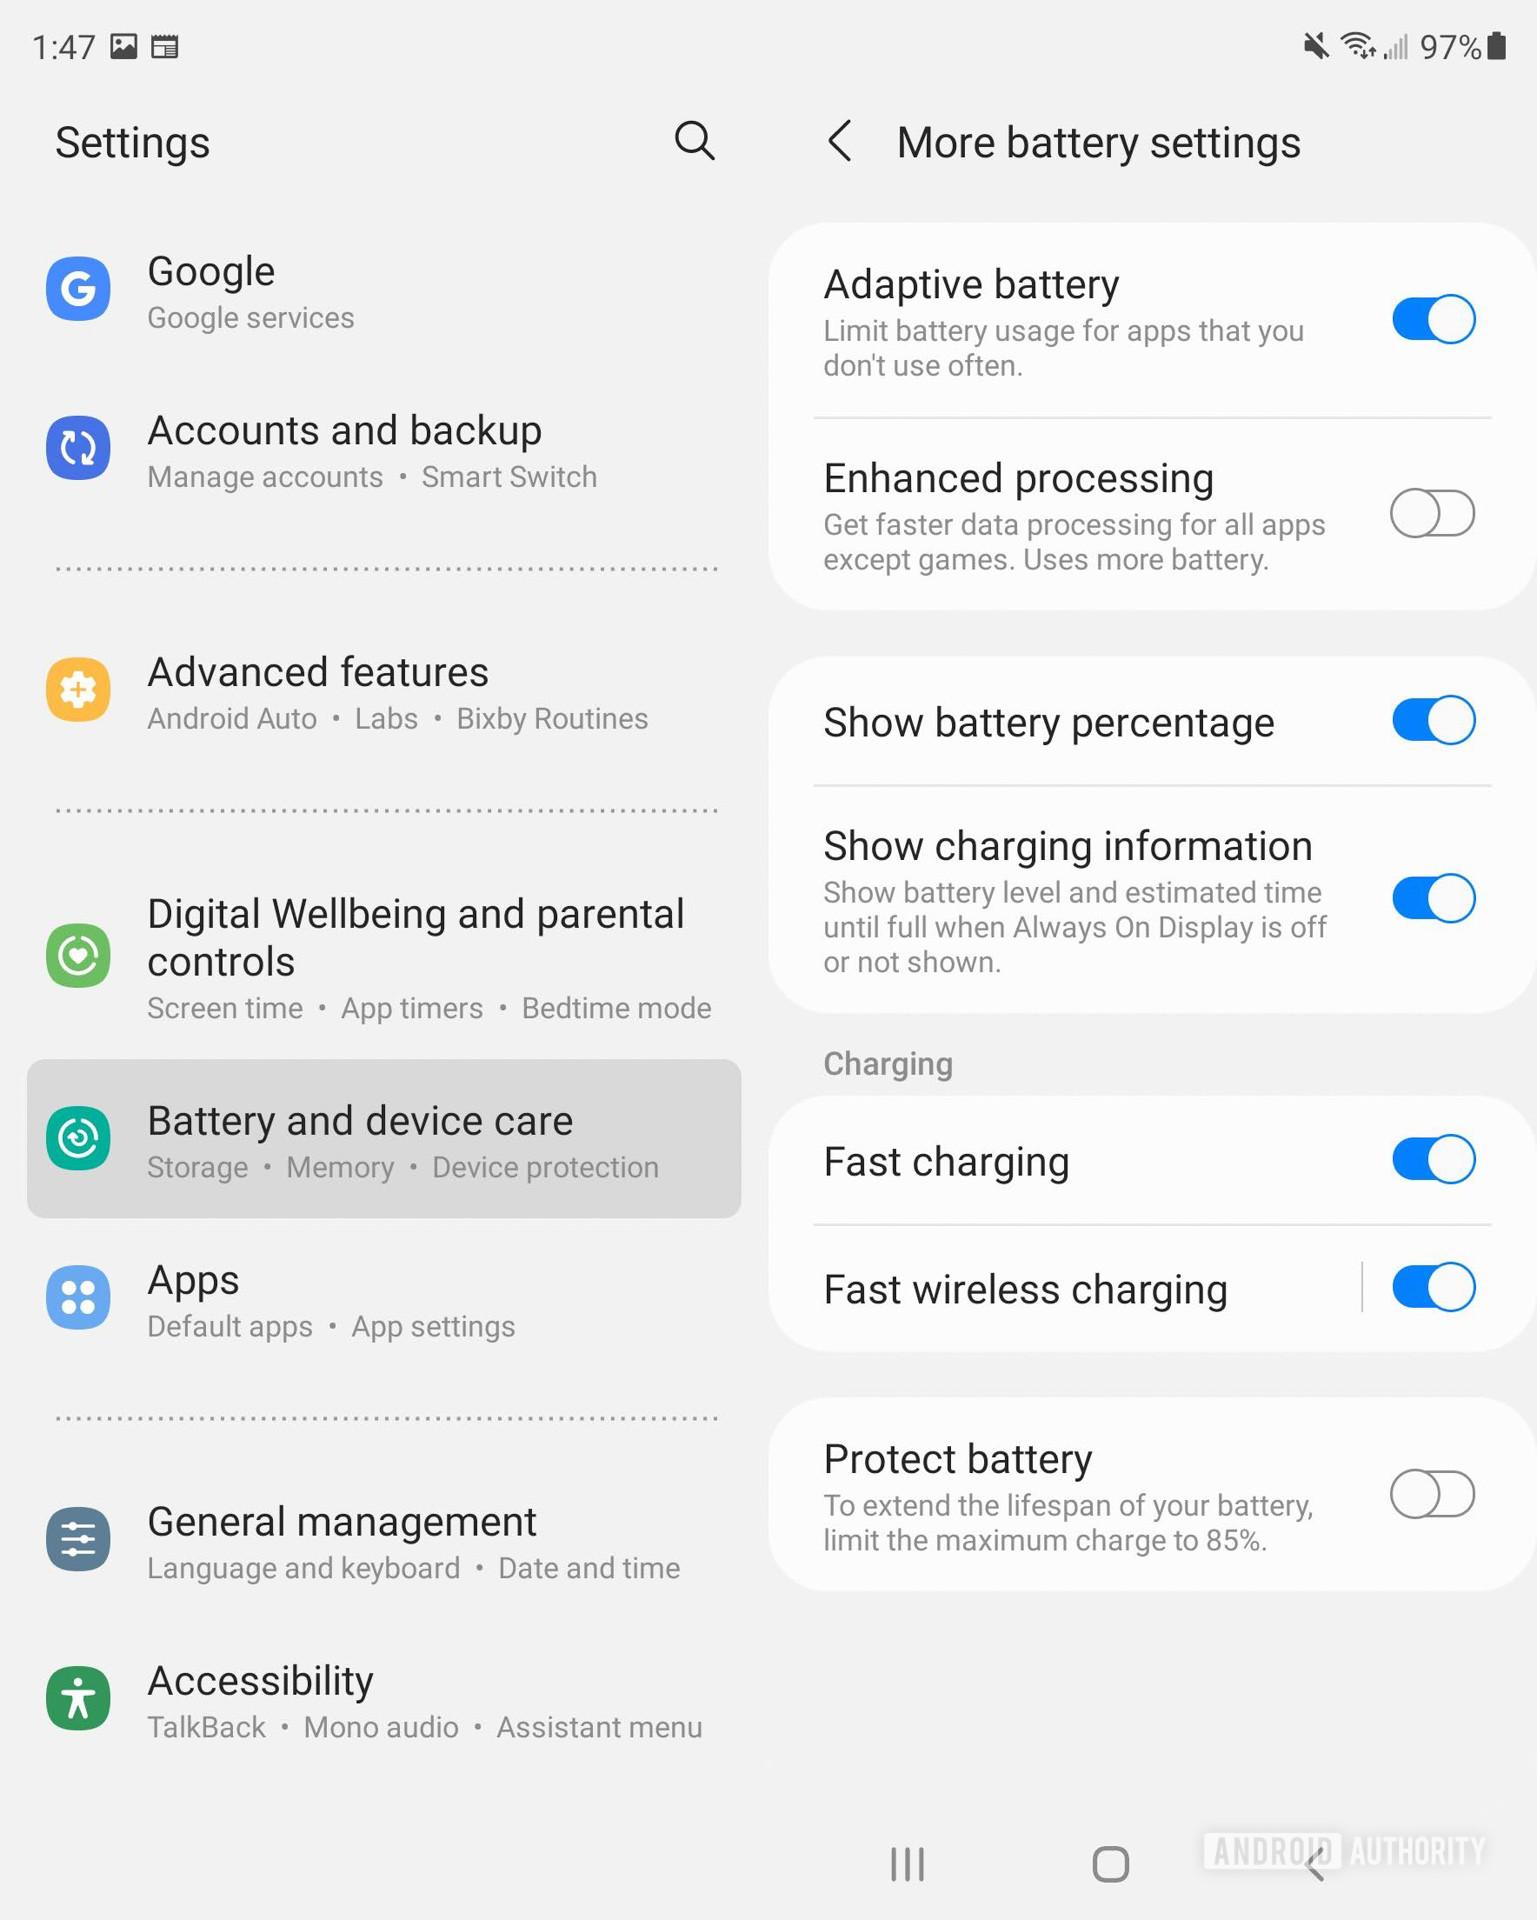 Samsung Galaxy Z Fold 3 battery settings